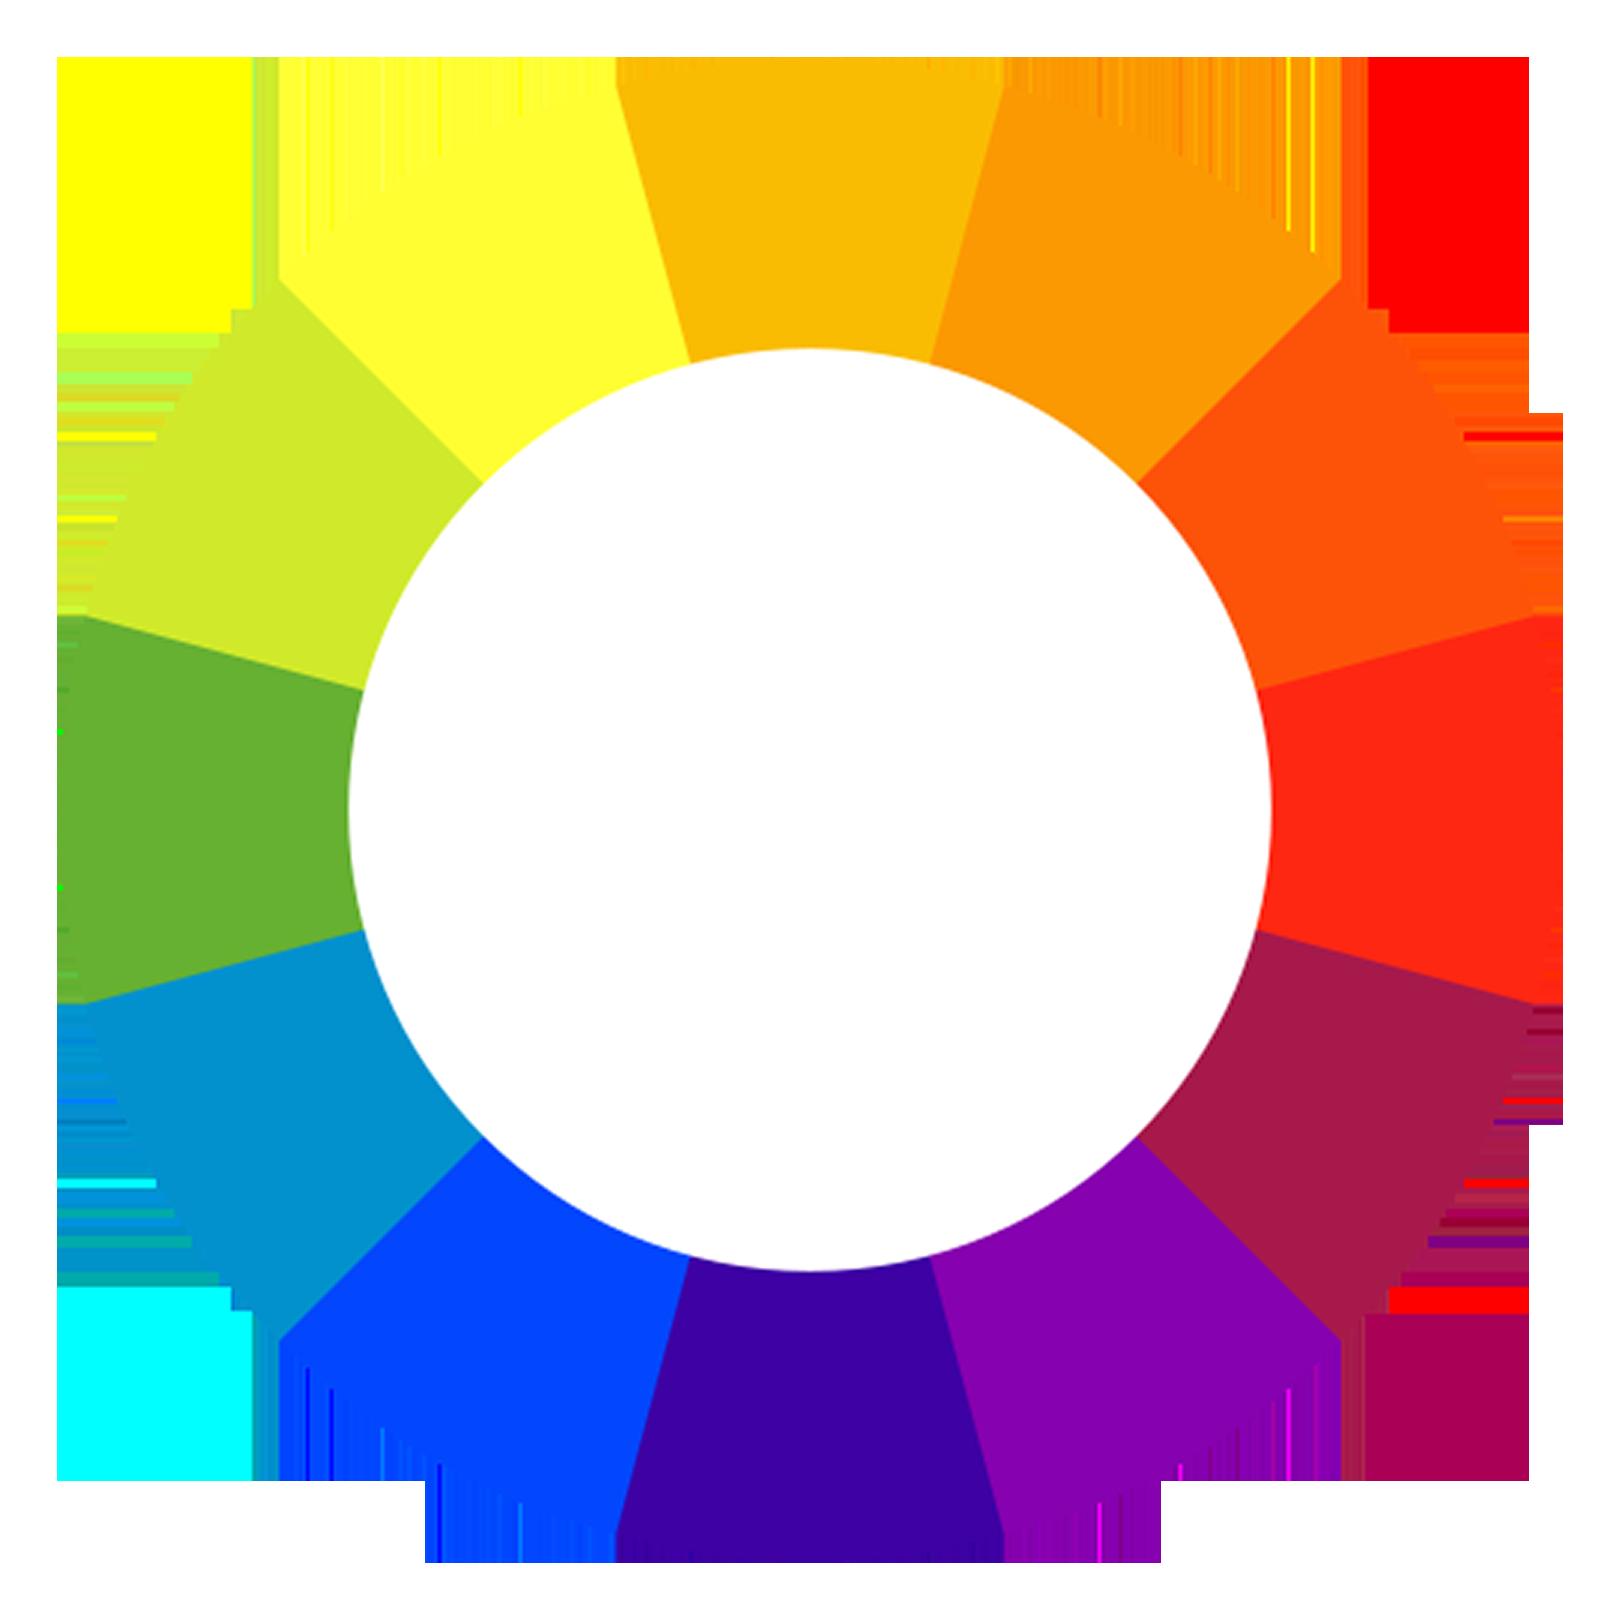 Website Color Schemes That Are Changing The Way We Design Inside Design Blog